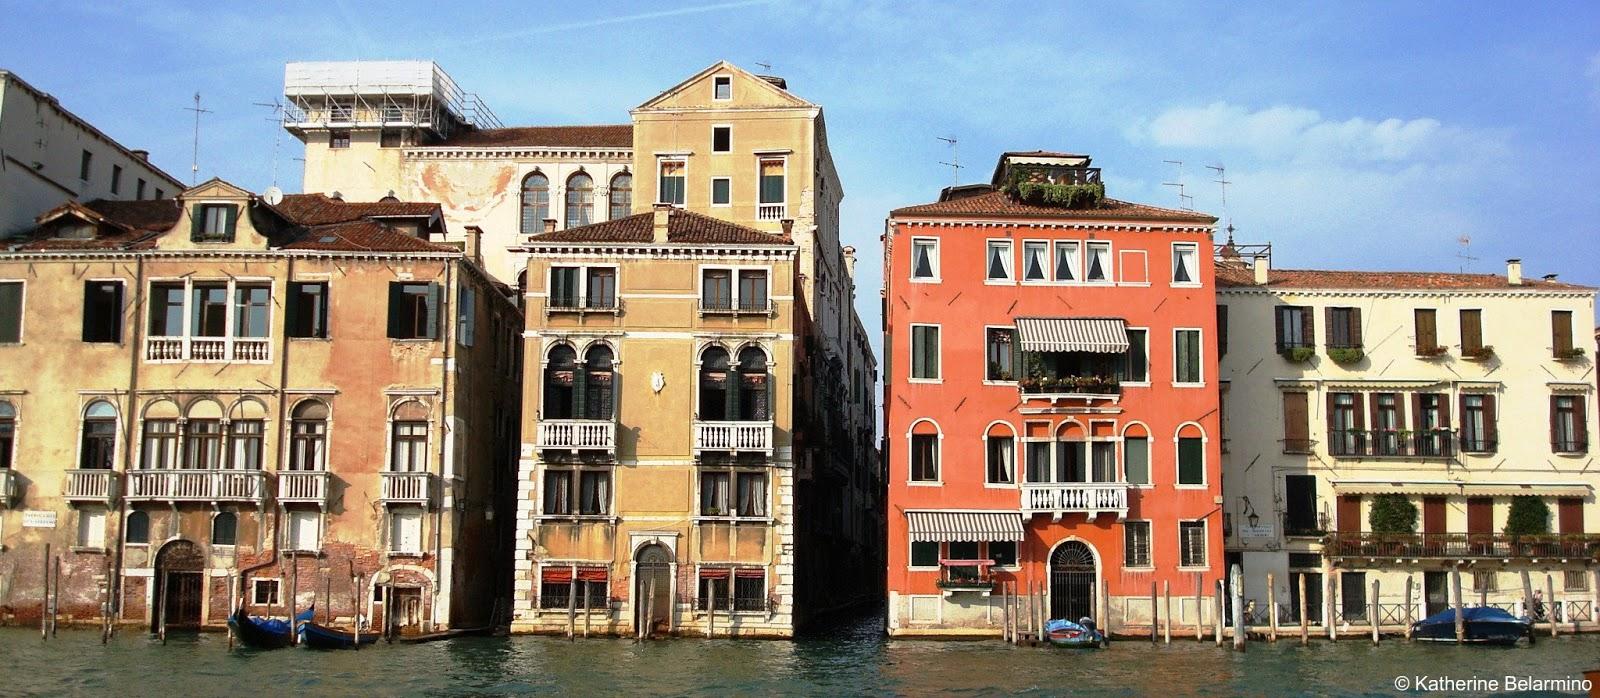 Venetian Buildings venice beyond st. mark's square | travel the world